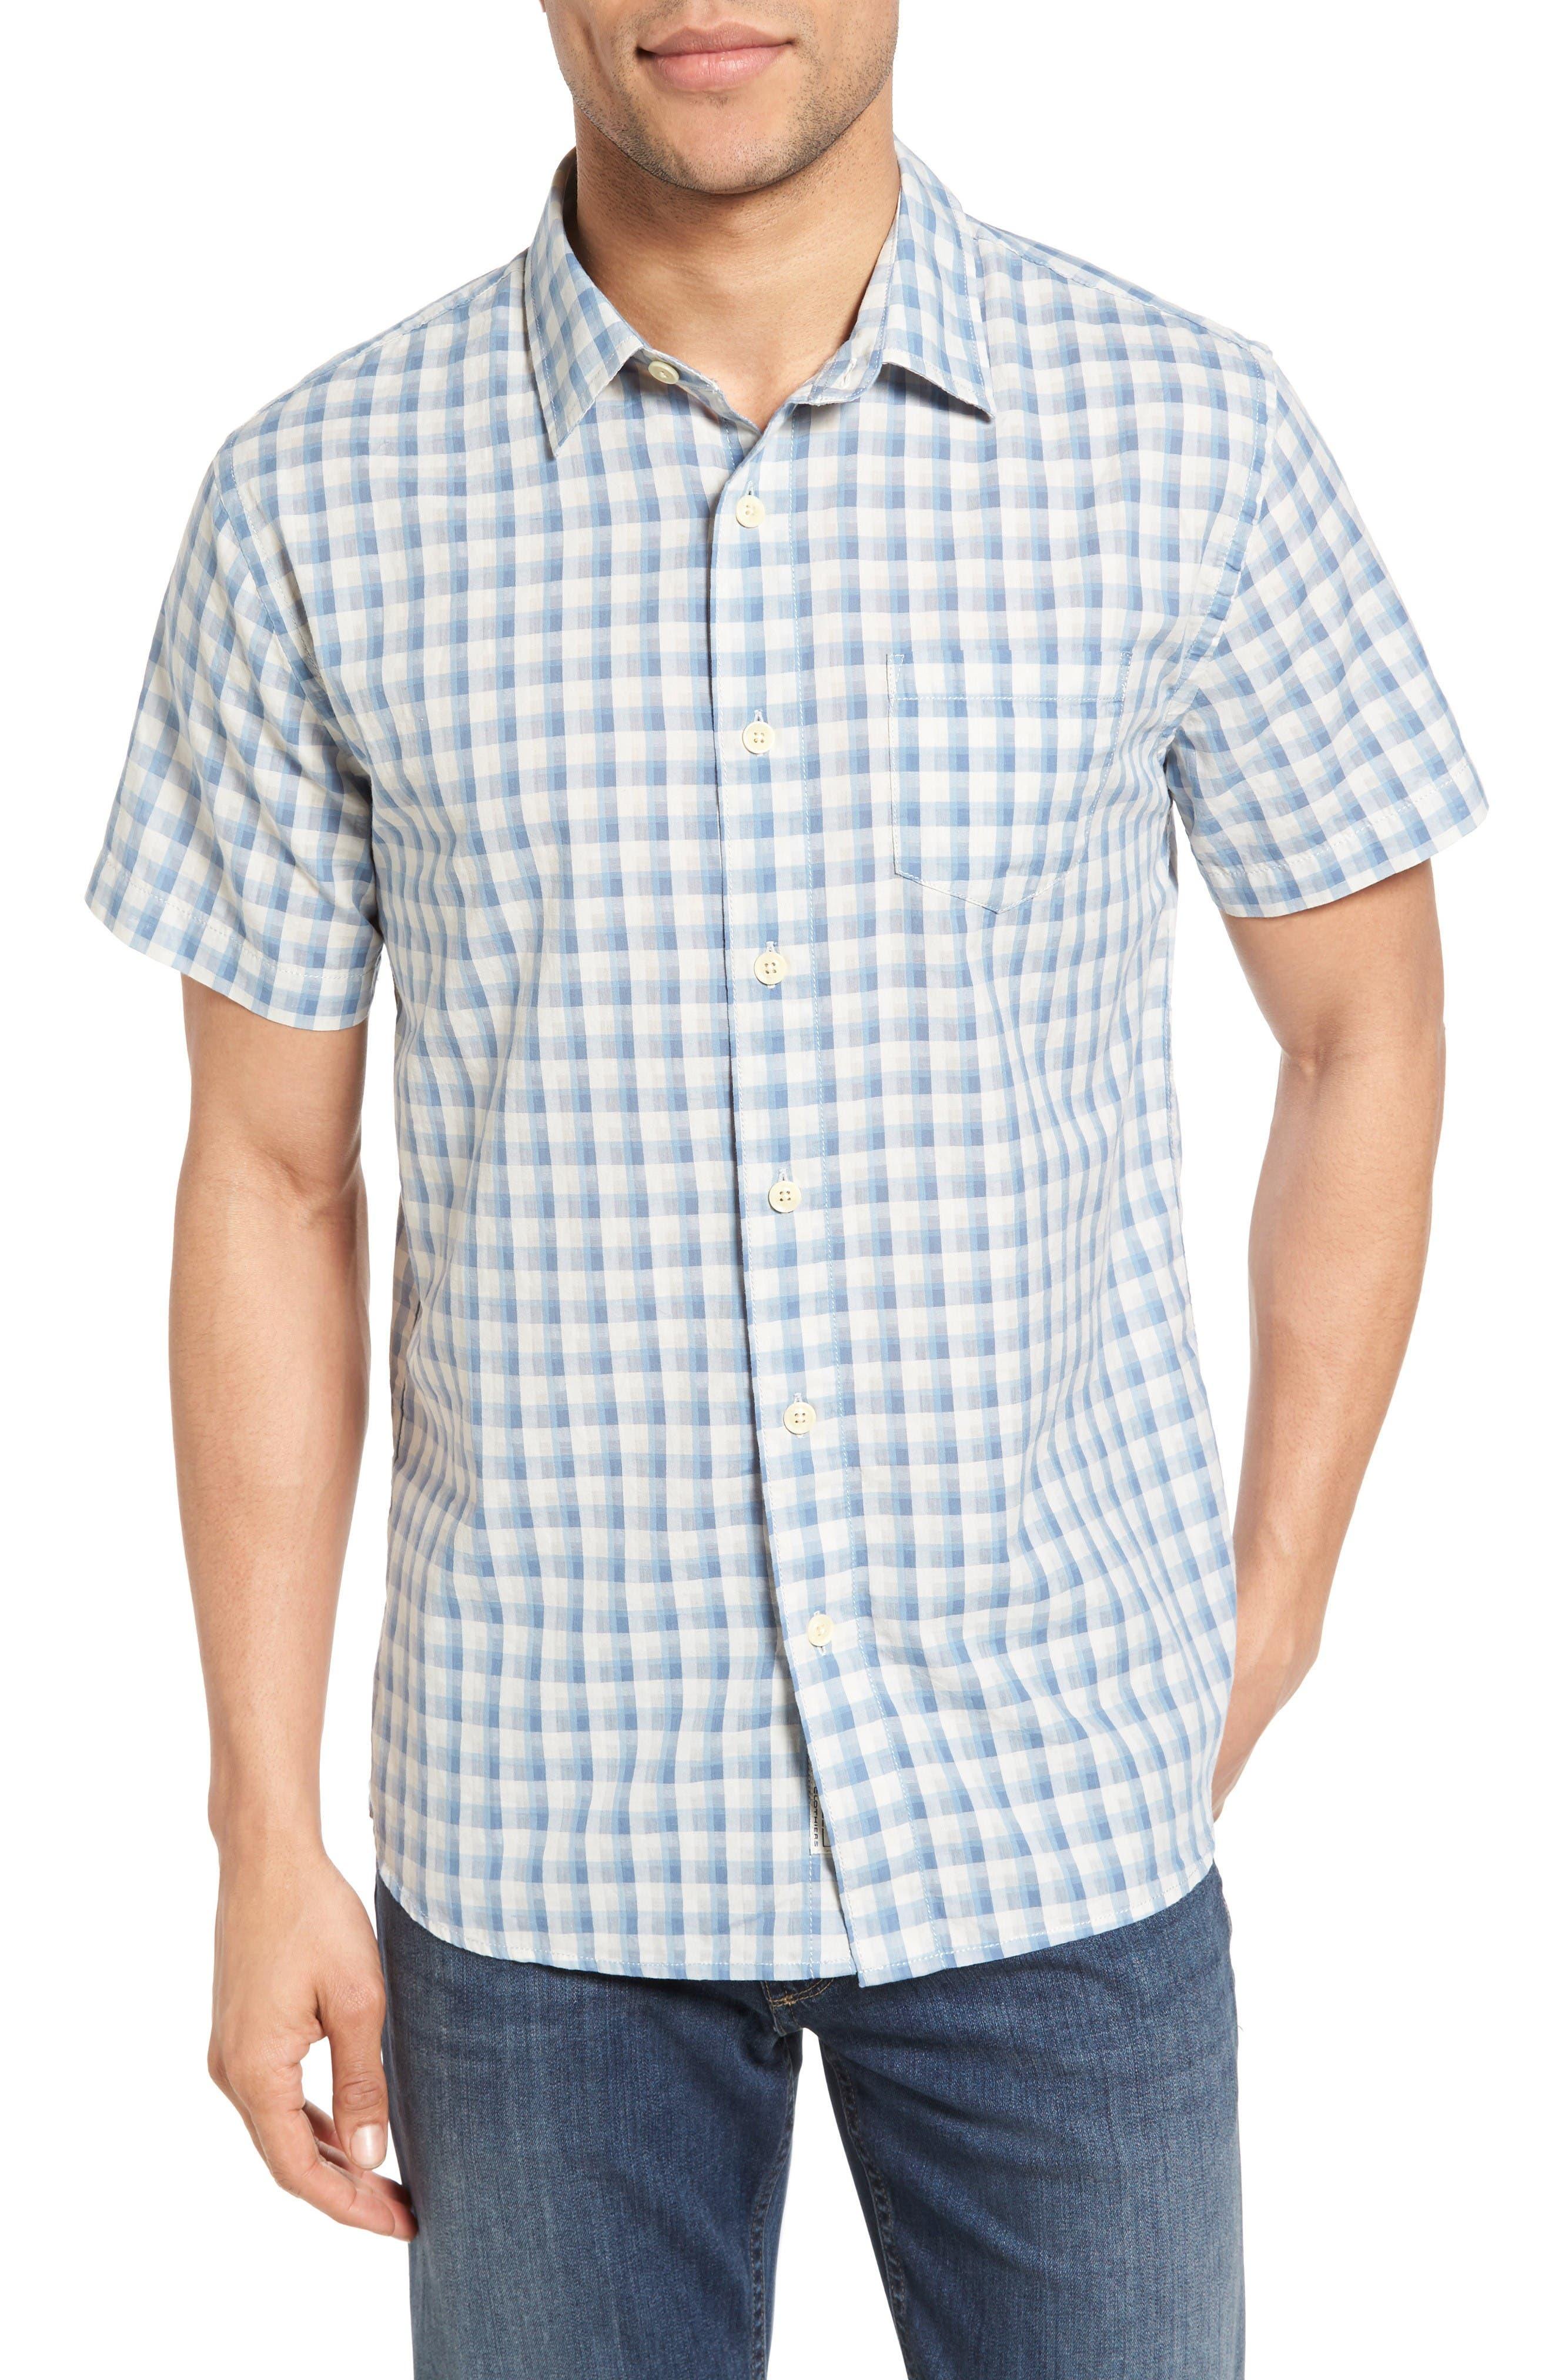 Grayers Grange Trim Fit Shadow Gingham Sport Shirt